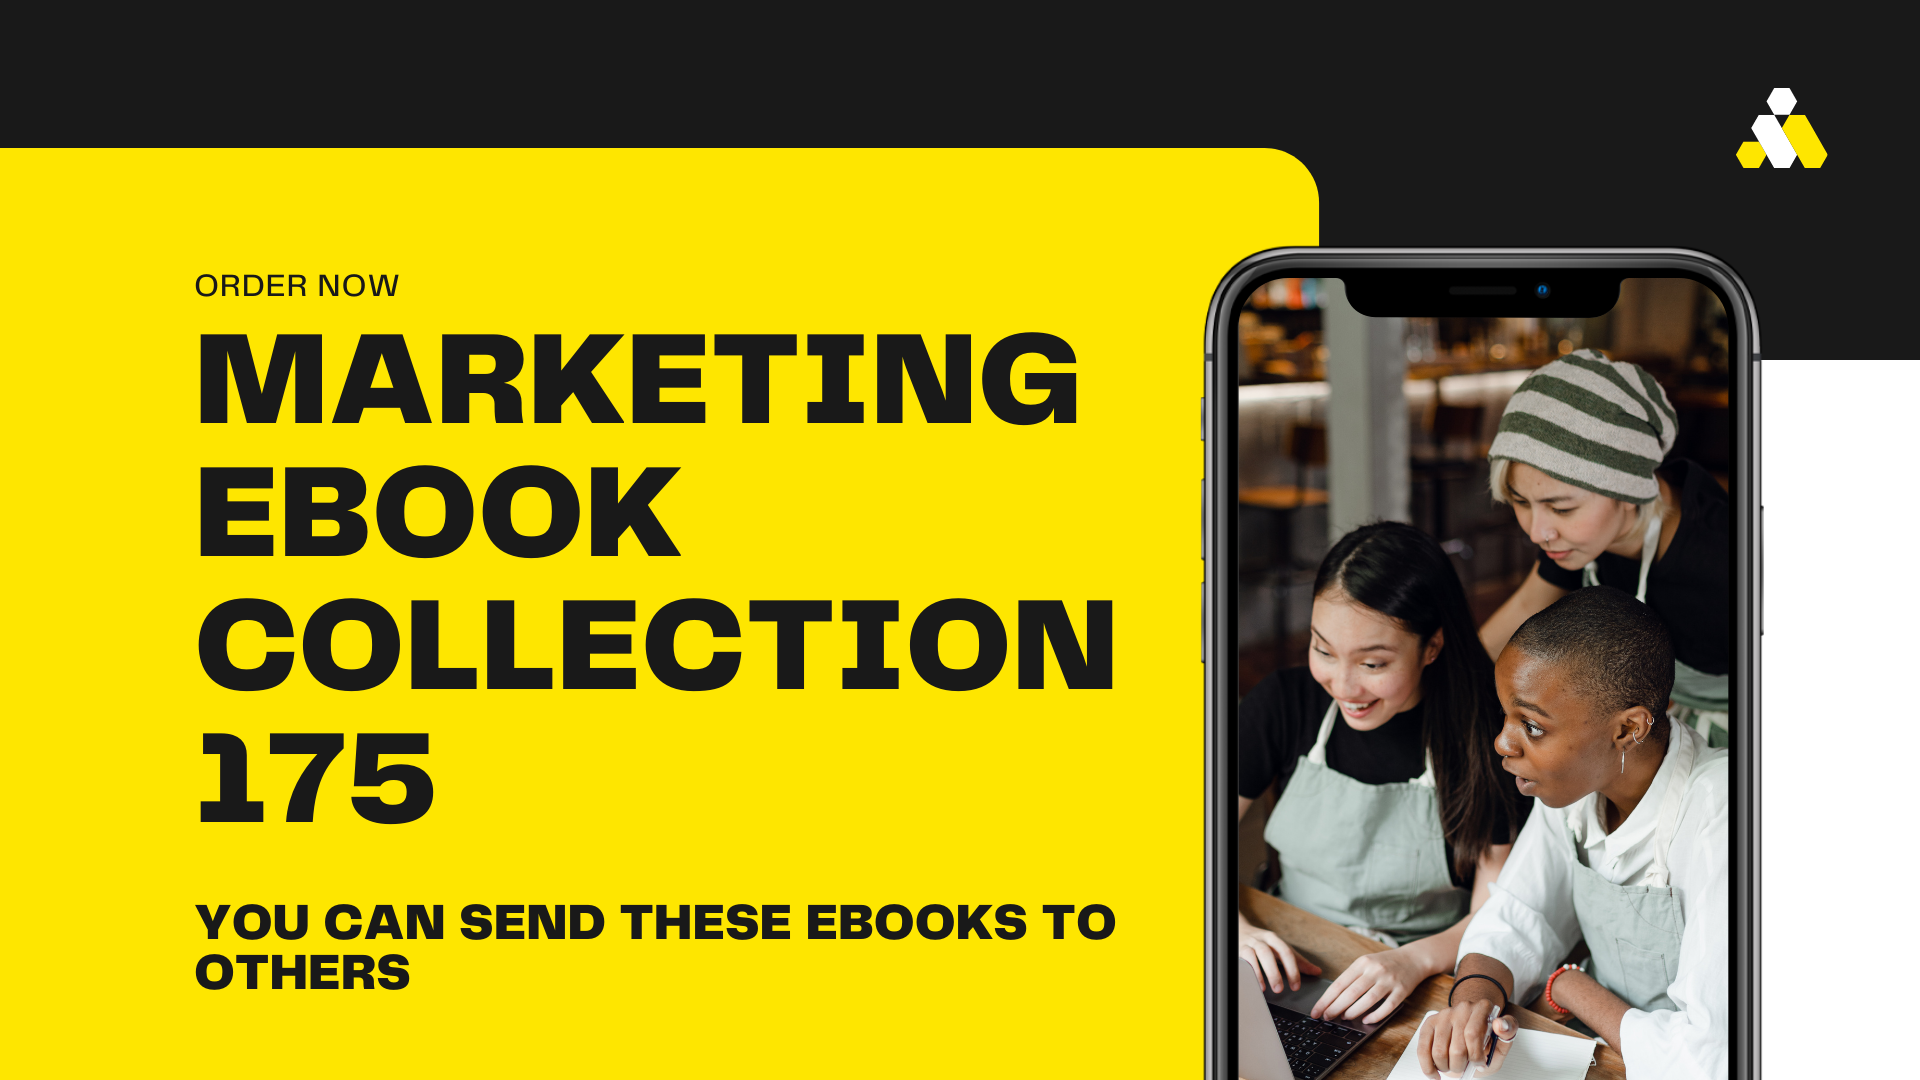 send you the 175 marketing eBooks